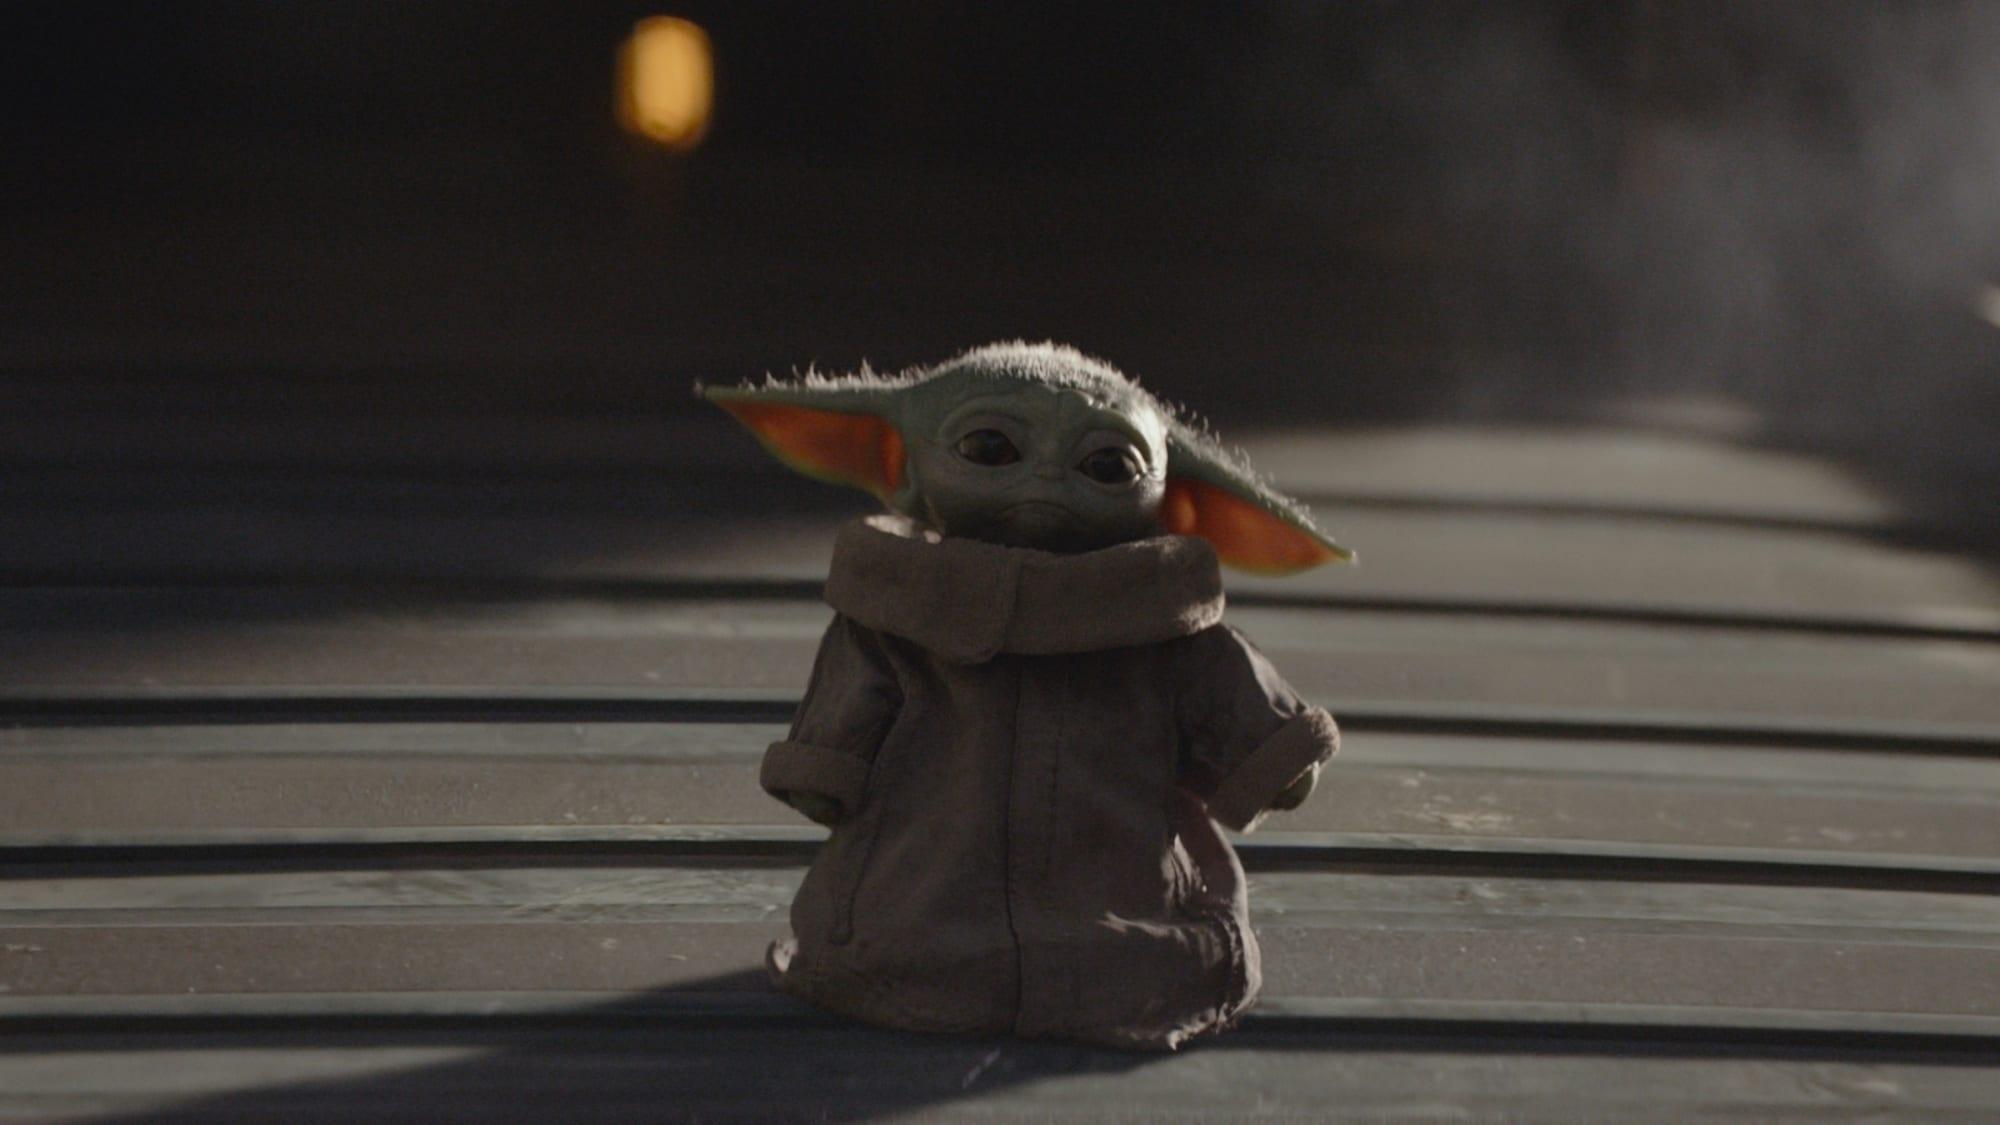 The Mandalorian: Is Baby Yoda Emperor Palpatine's bounty?